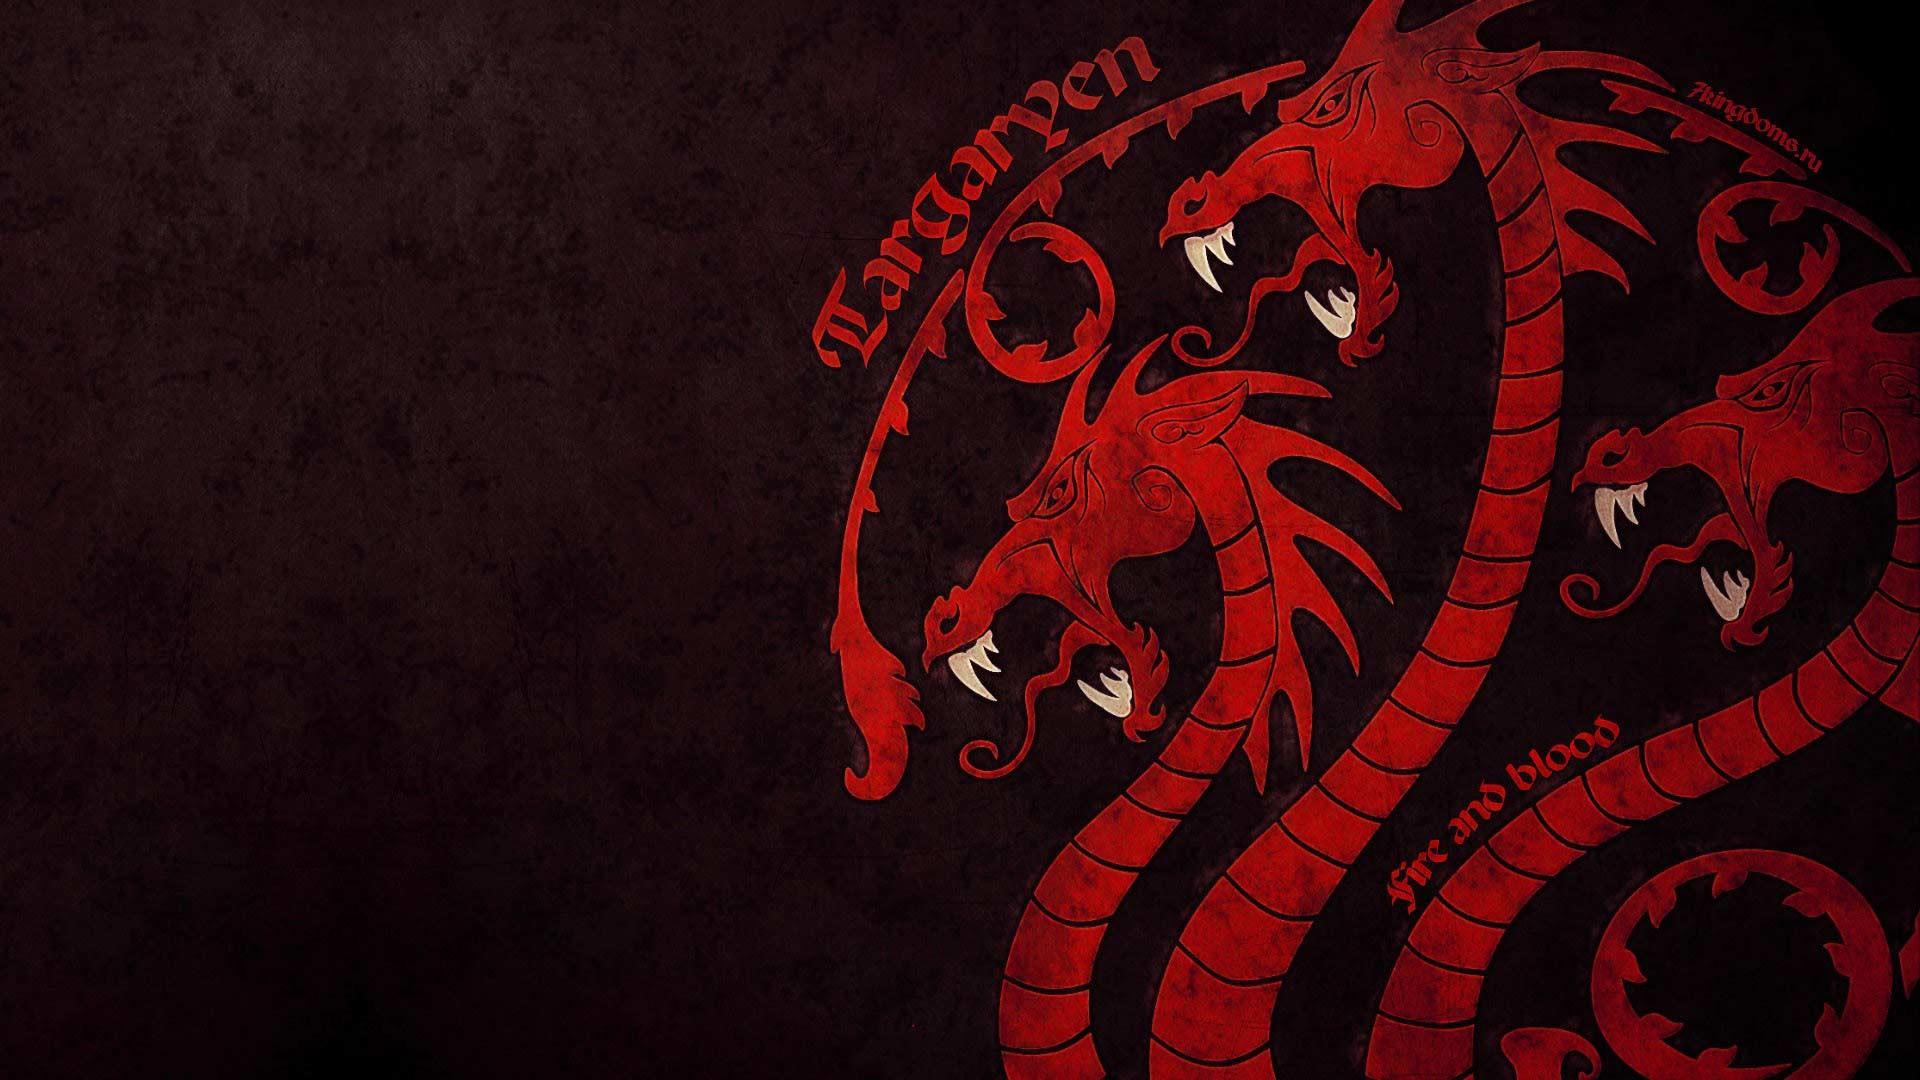 Res: 1920x1080, Game of Thrones Season 4 Wallpapers: HD GOT Season 4 Desktop Wallpaper